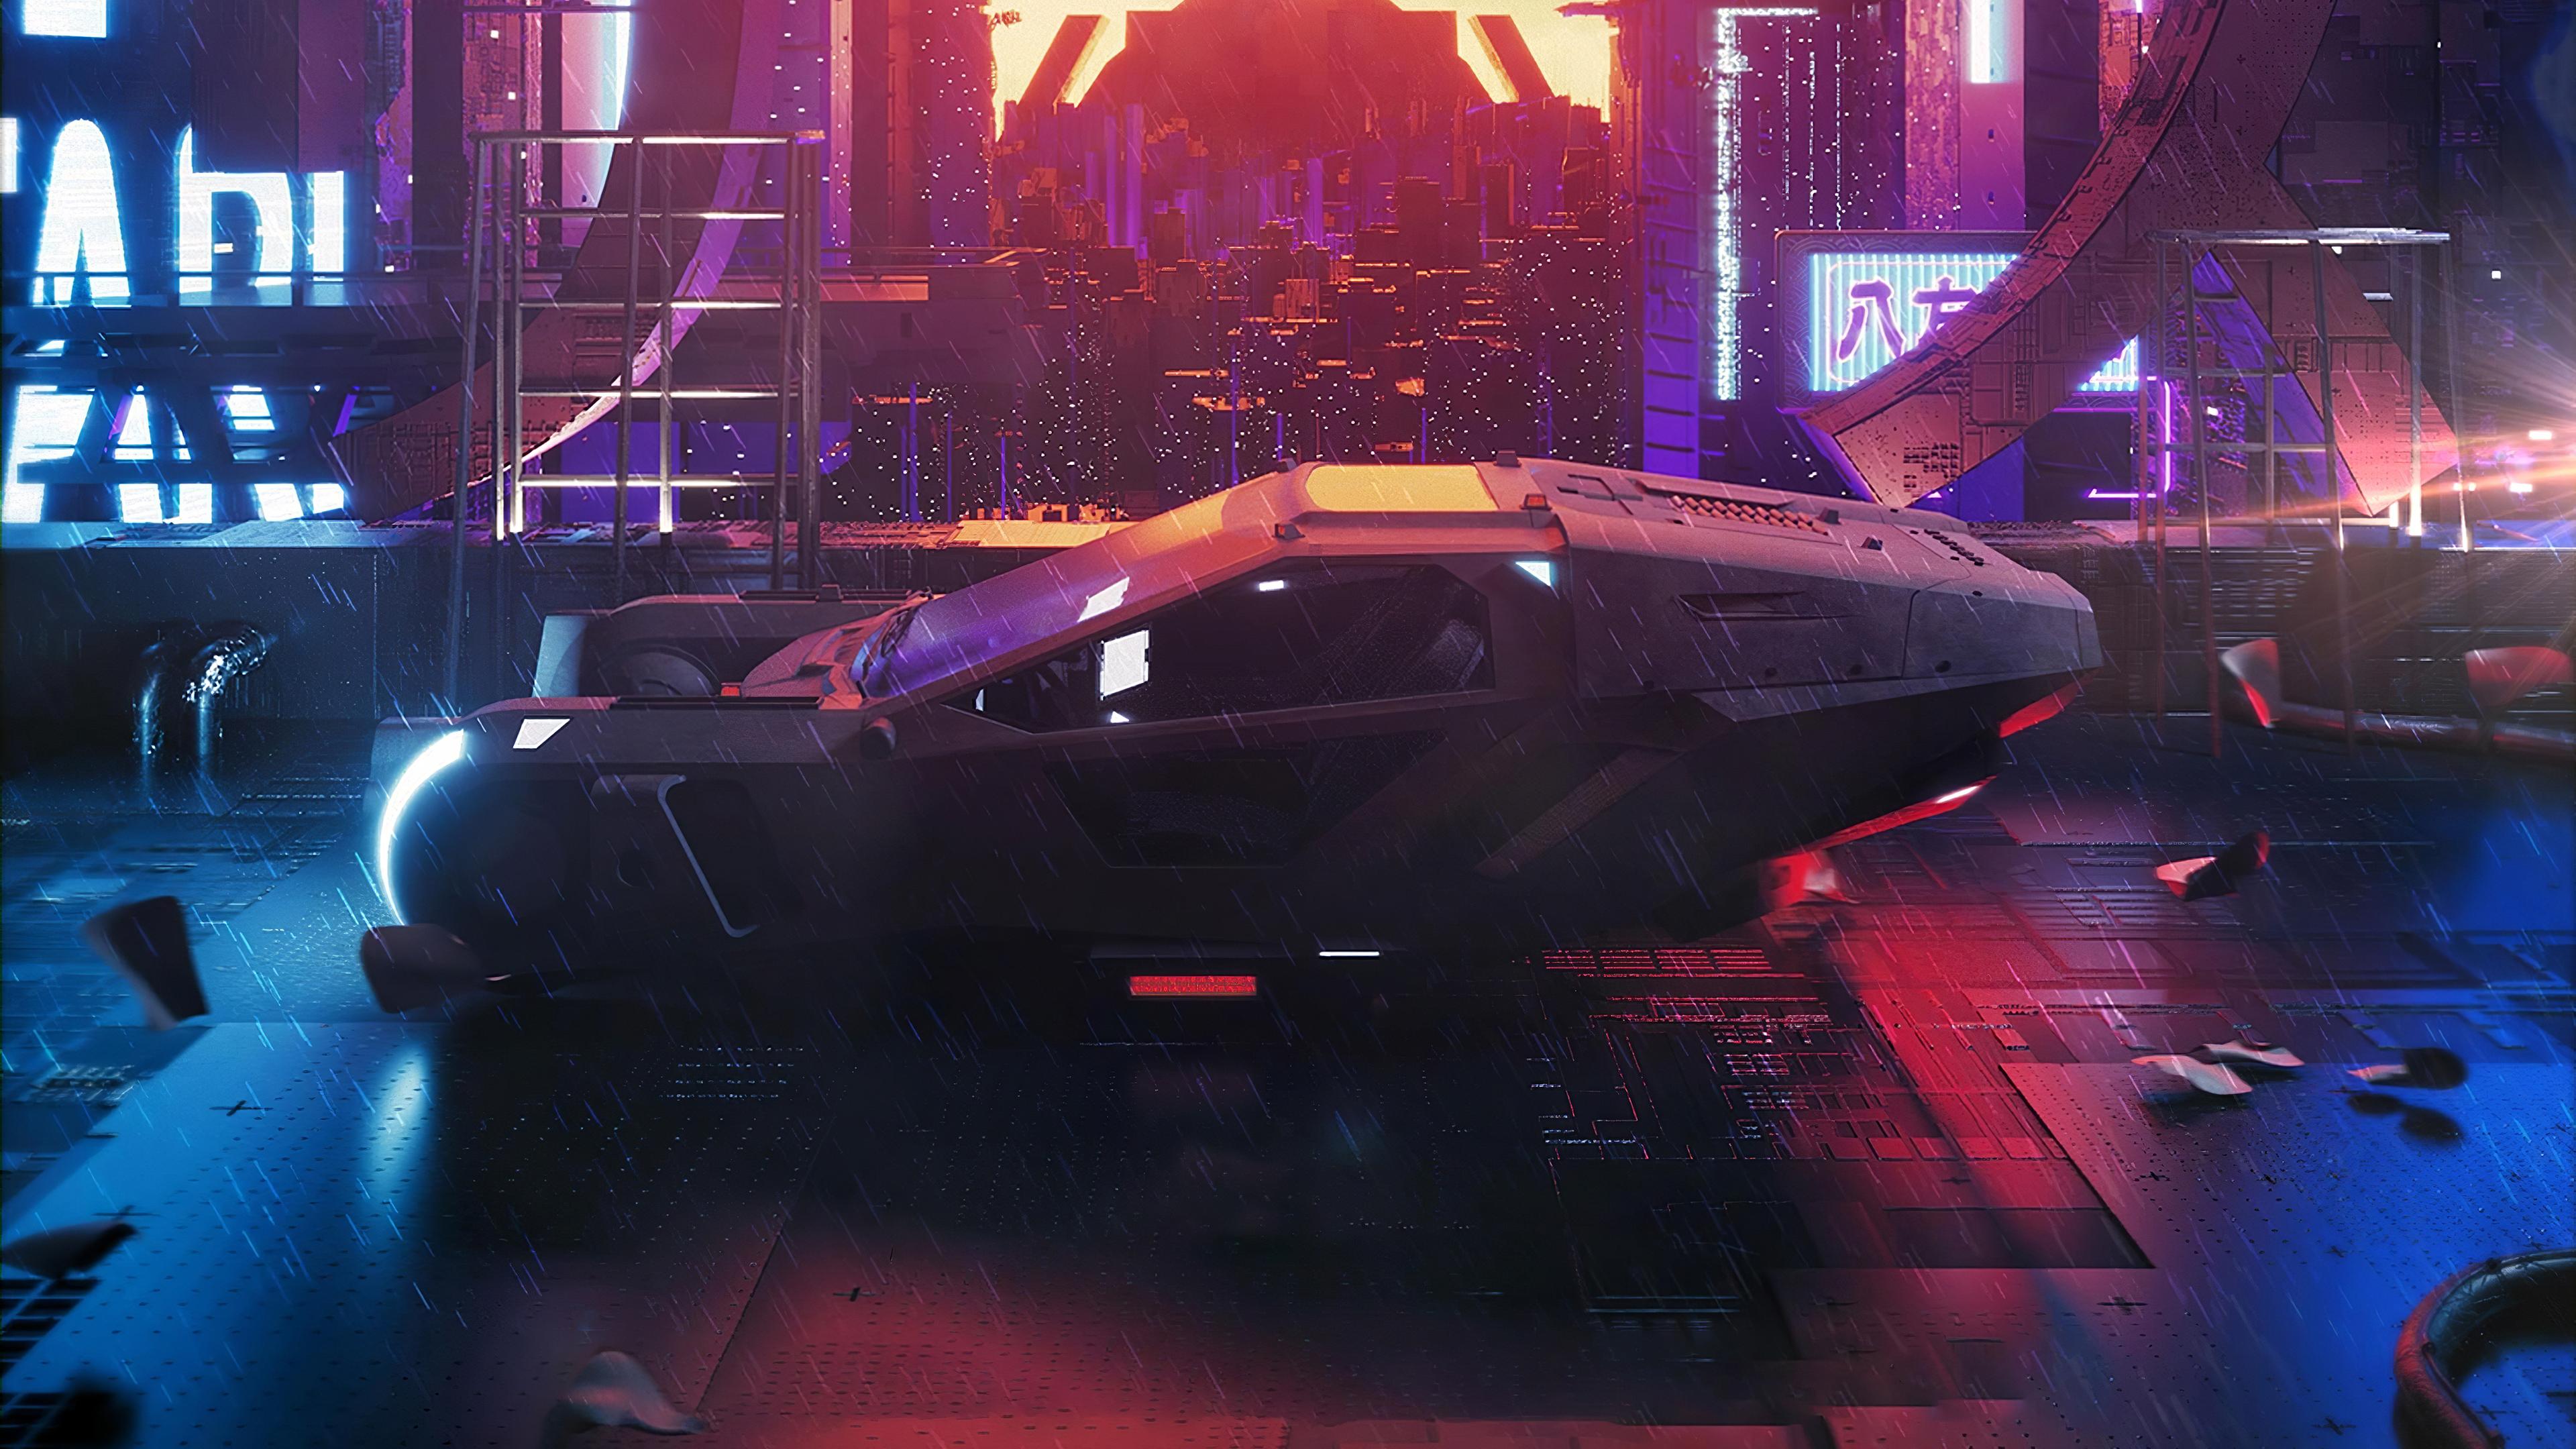 blade runner 2049 scifi car 1589579173 - Blade Runner 2049 Scifi Car - Blade Runner 2049 Scifi Car wallpapers 4k